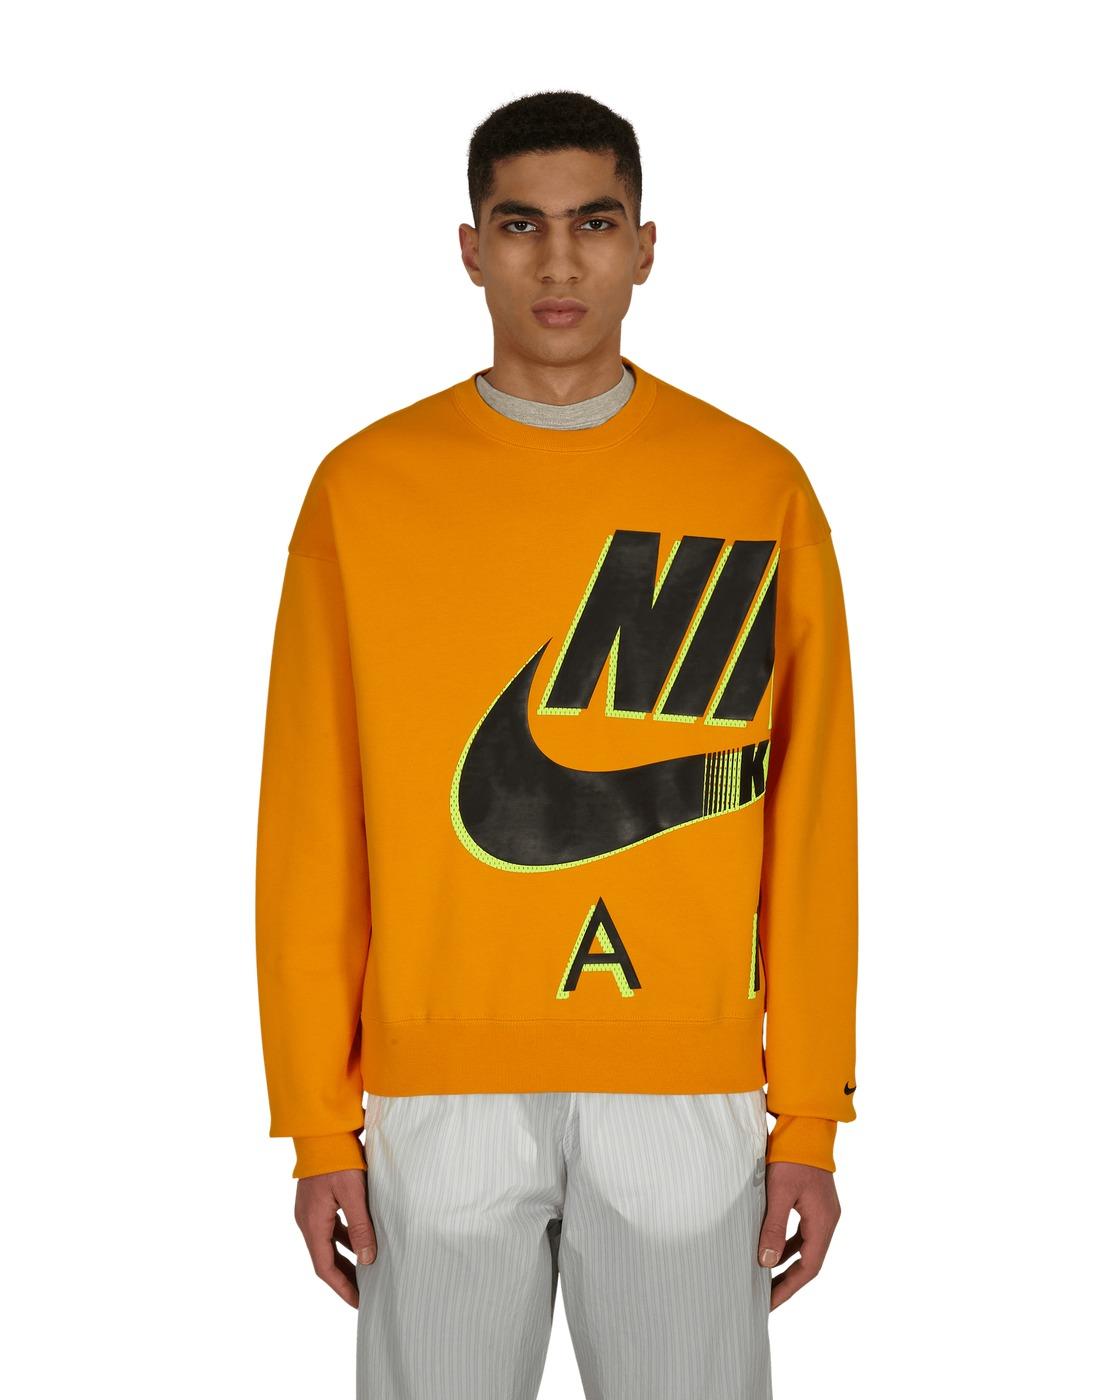 Nike Special Project Kim Jones Crewneck Sweatshirt Circuit Orange